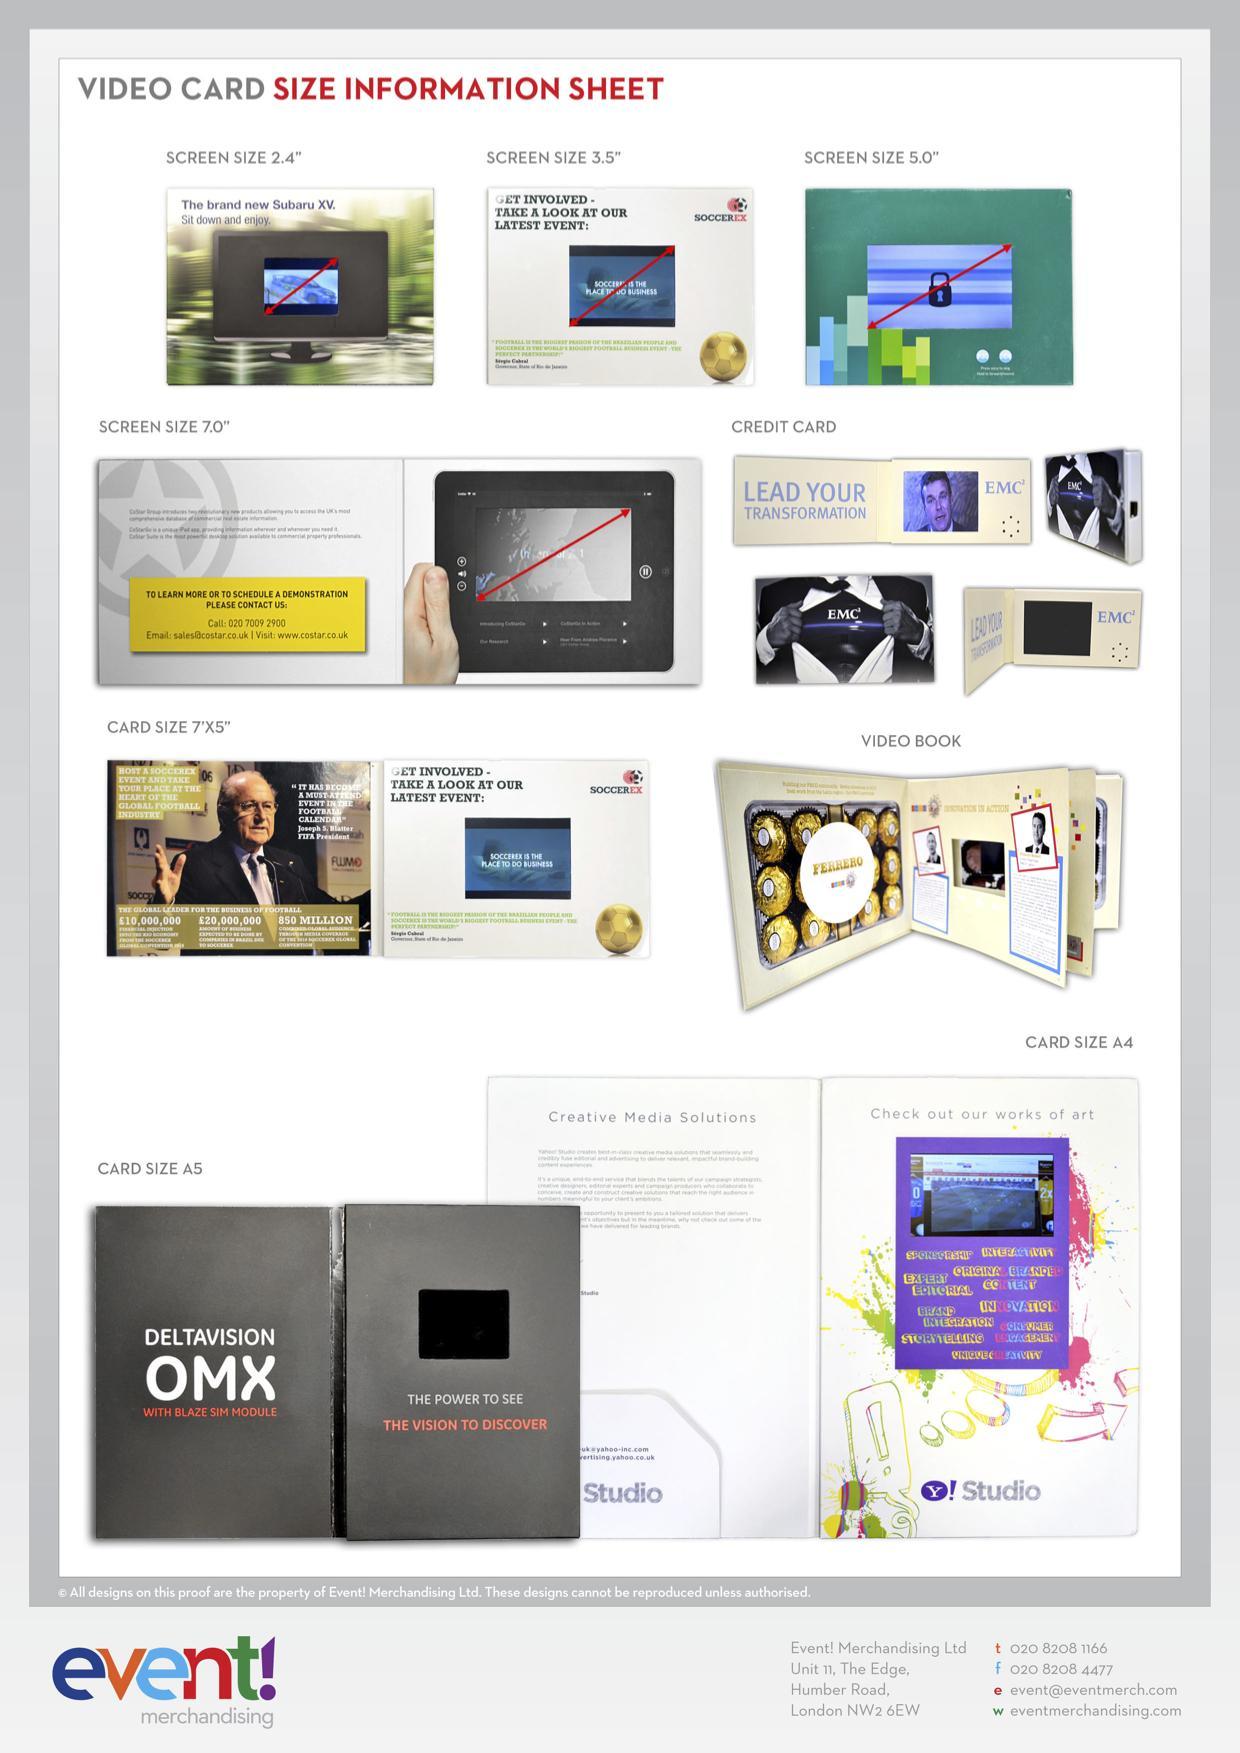 Video Brochure sizes